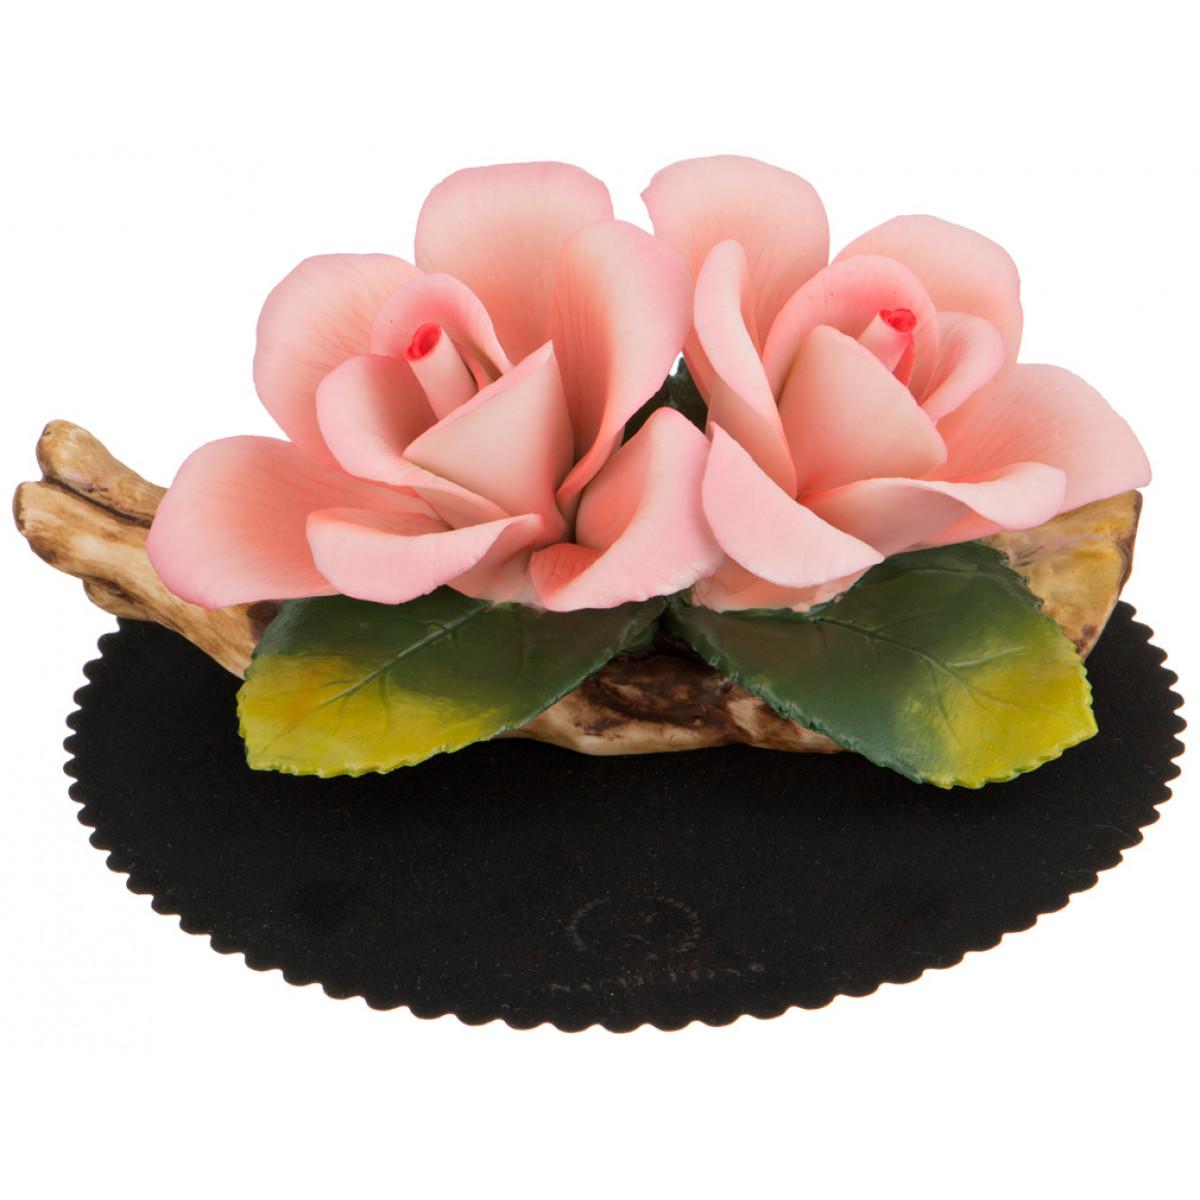 {} Napoleon Искусственный цветок Lettie  (6х8х15 см) napoleon travelq 285 портативный газовый